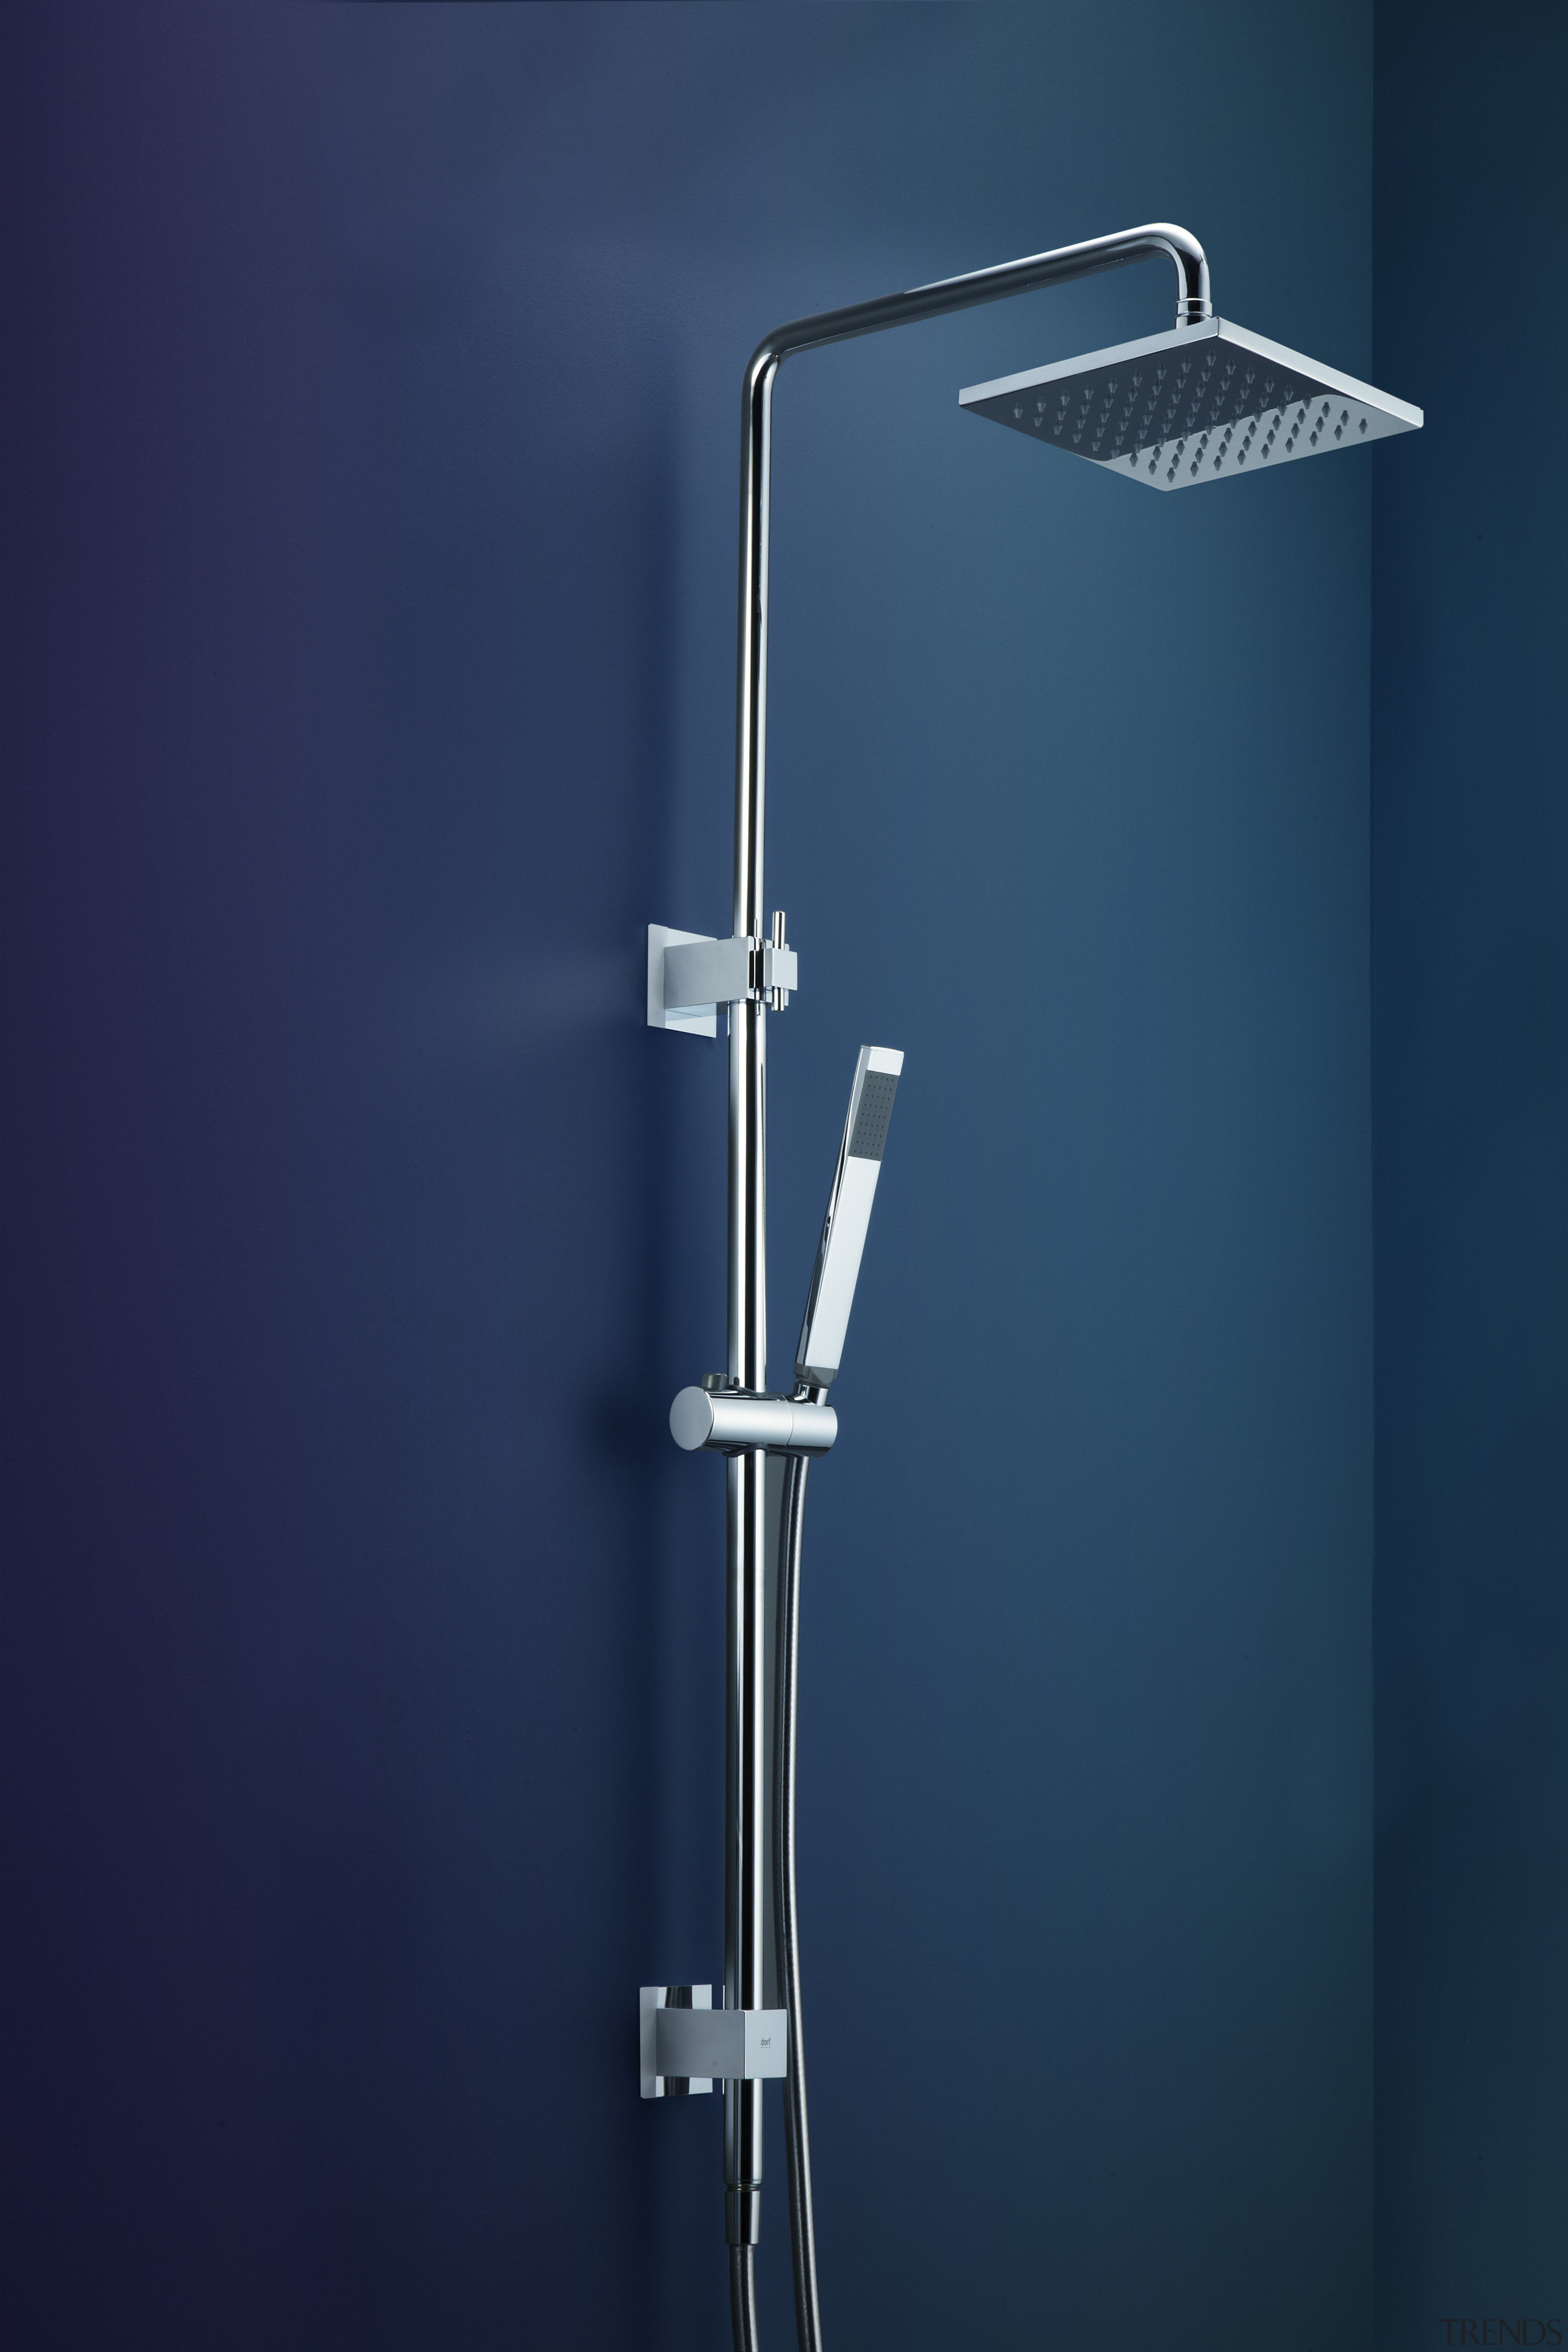 Dorf Rail Shower with Jovian Overhead  eco-friendly line, plumbing fixture, product design, shower, blue